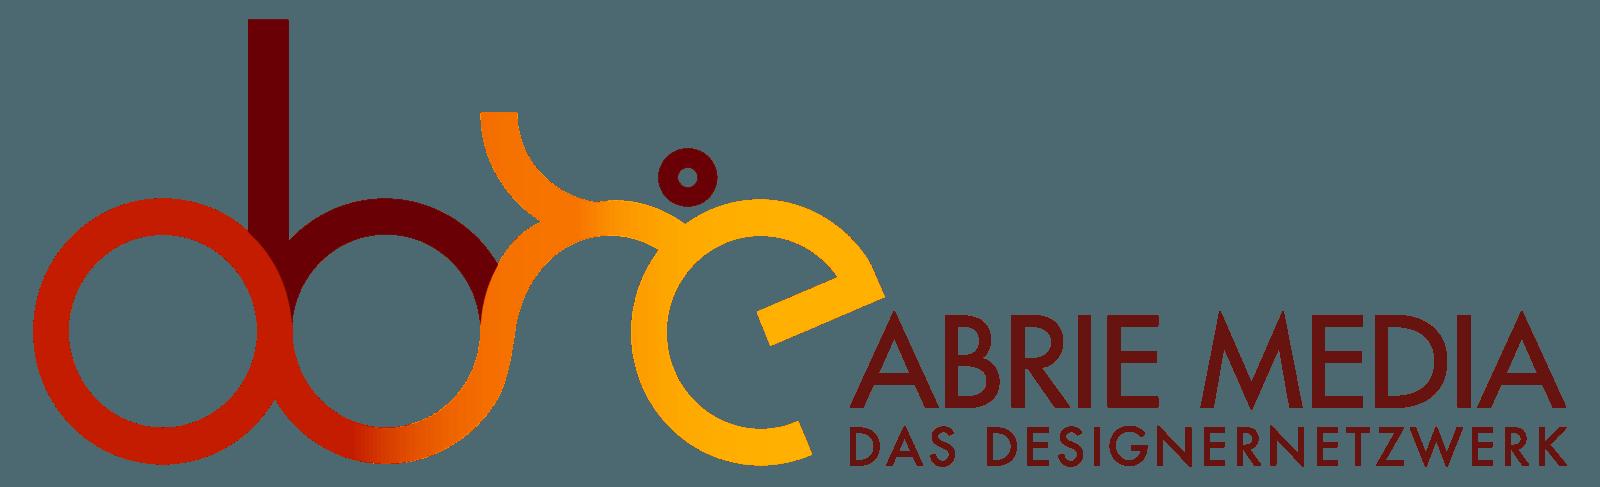 Abrie_Media_Logo-03